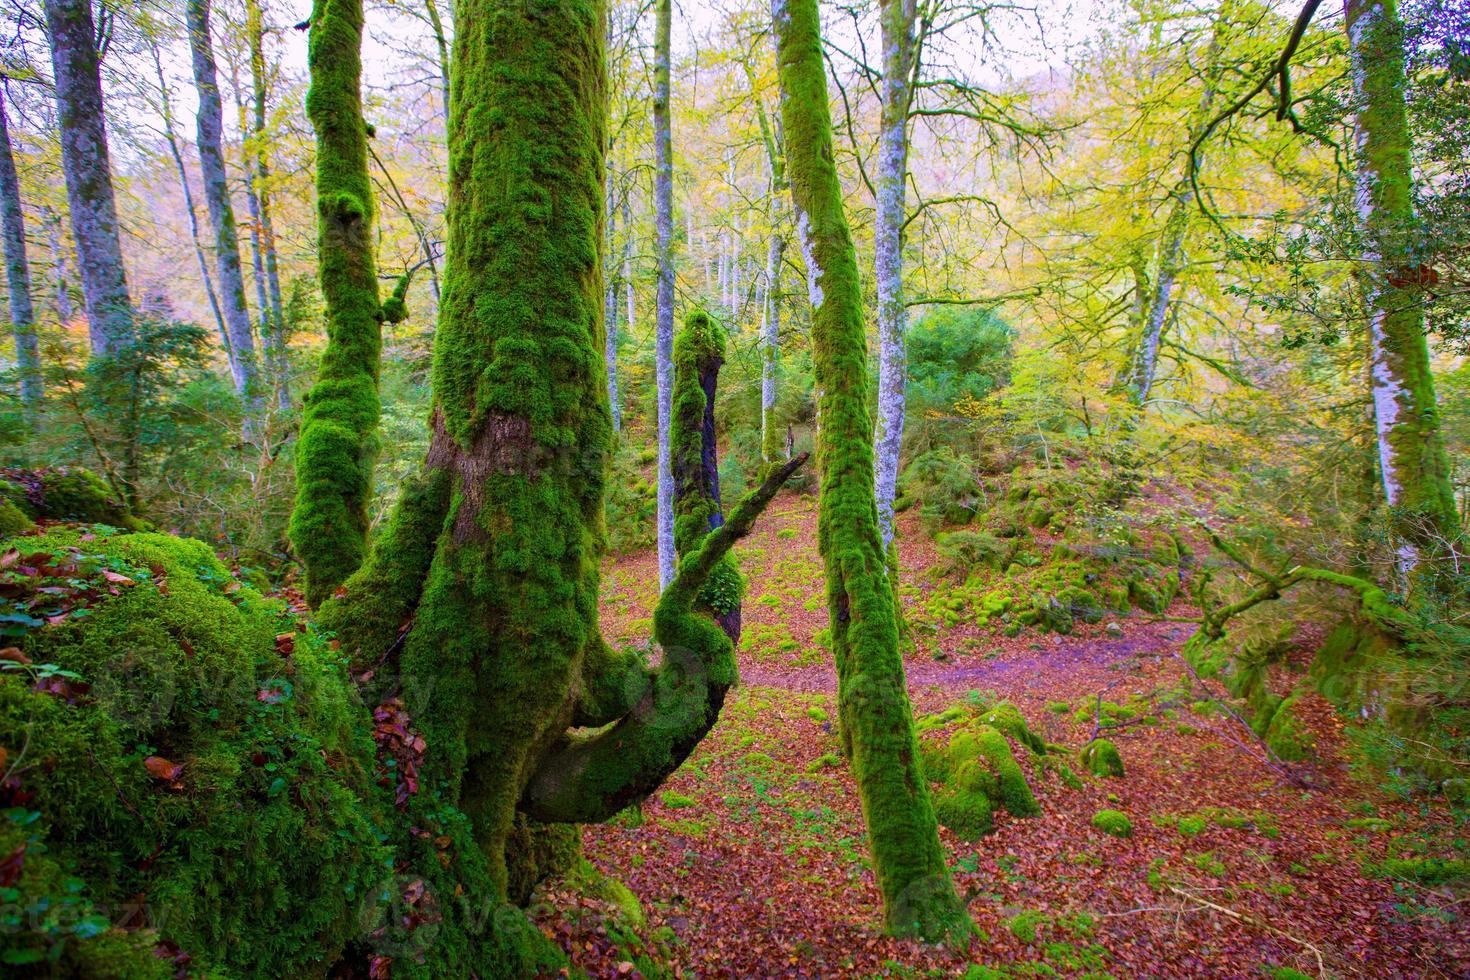 höst selva de irati bokjungel i navarra pyrenees Spanien foto